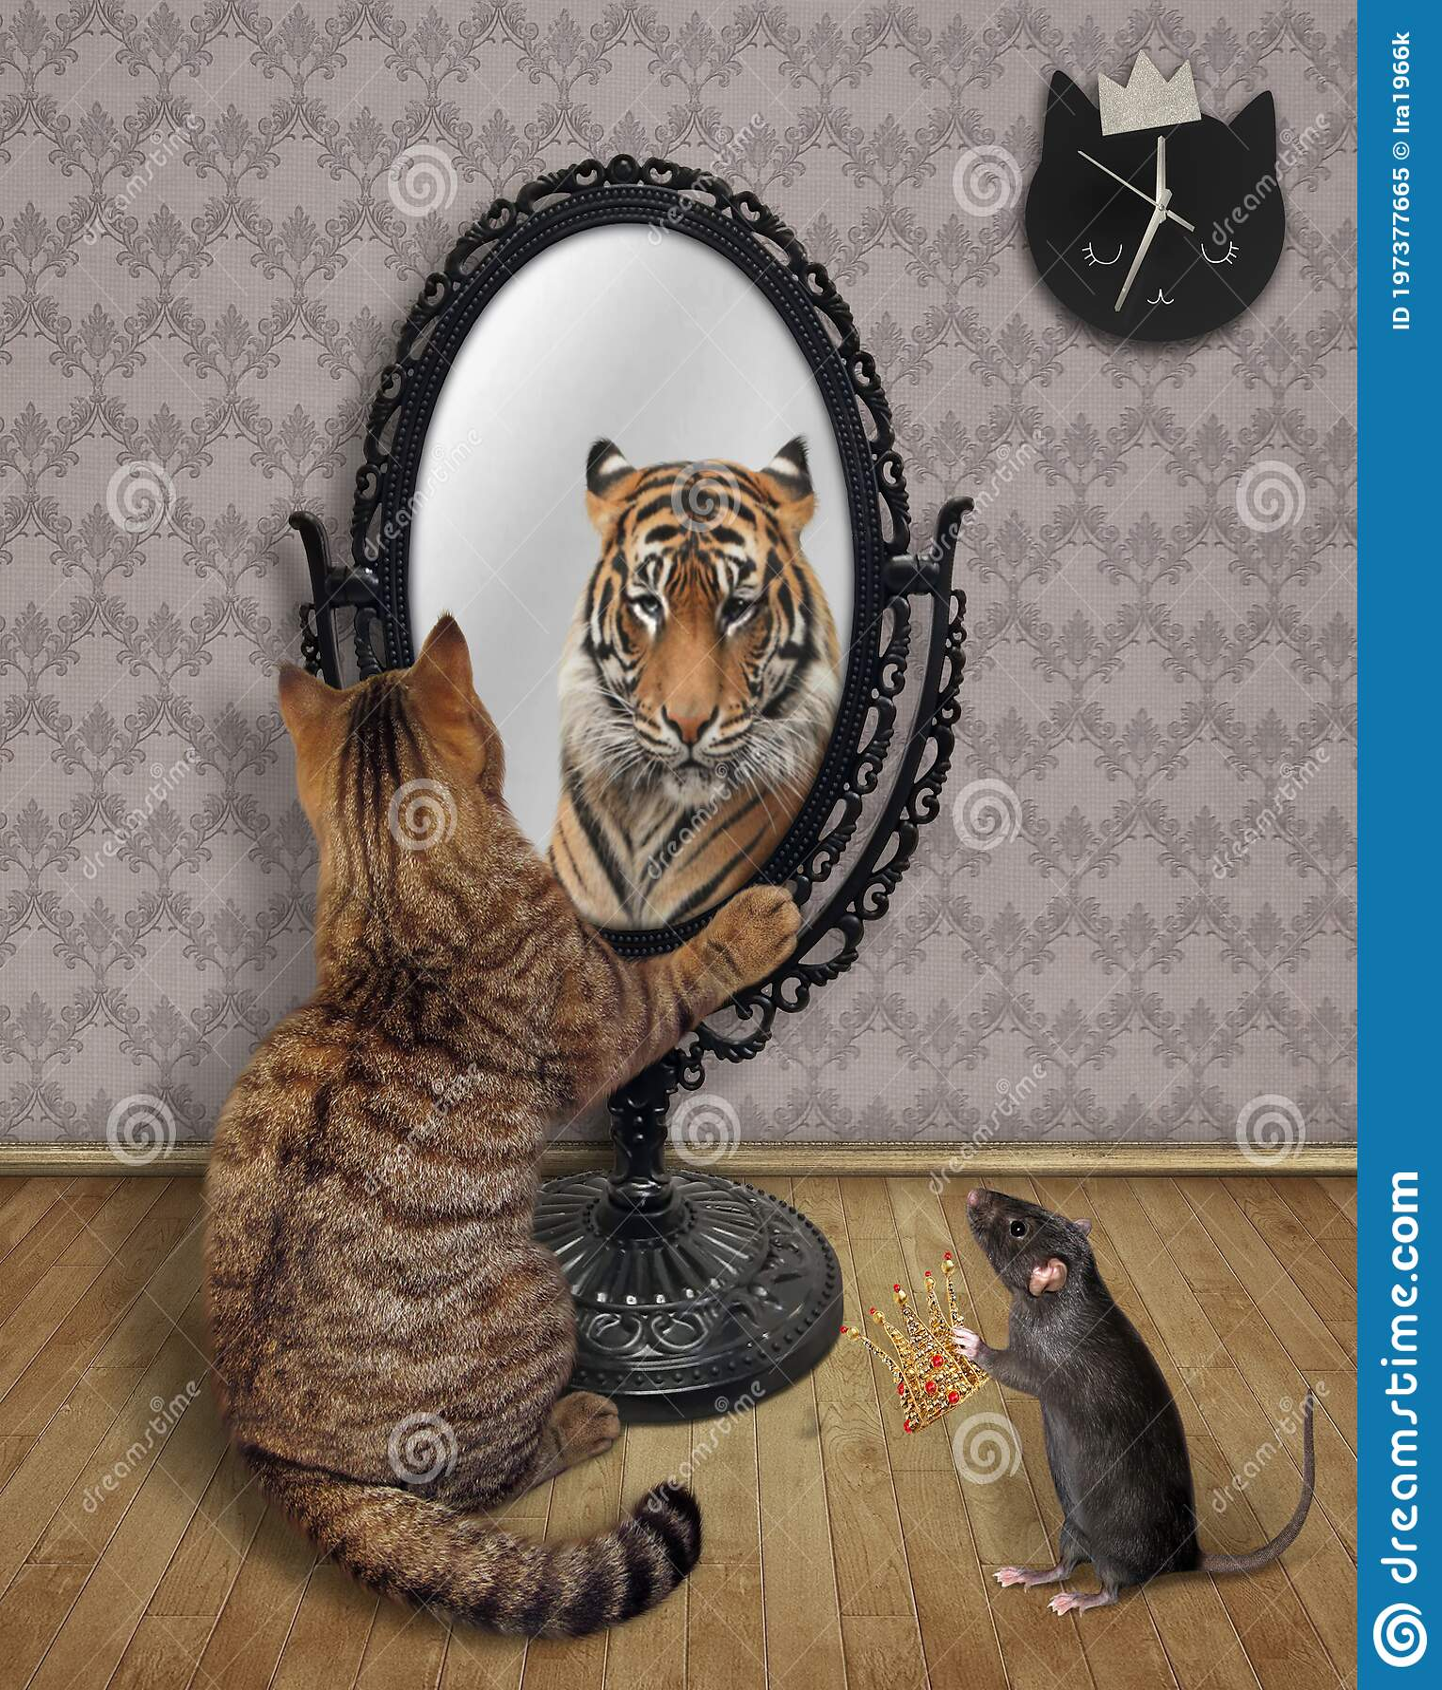 Lion mirror cat Cute Framed